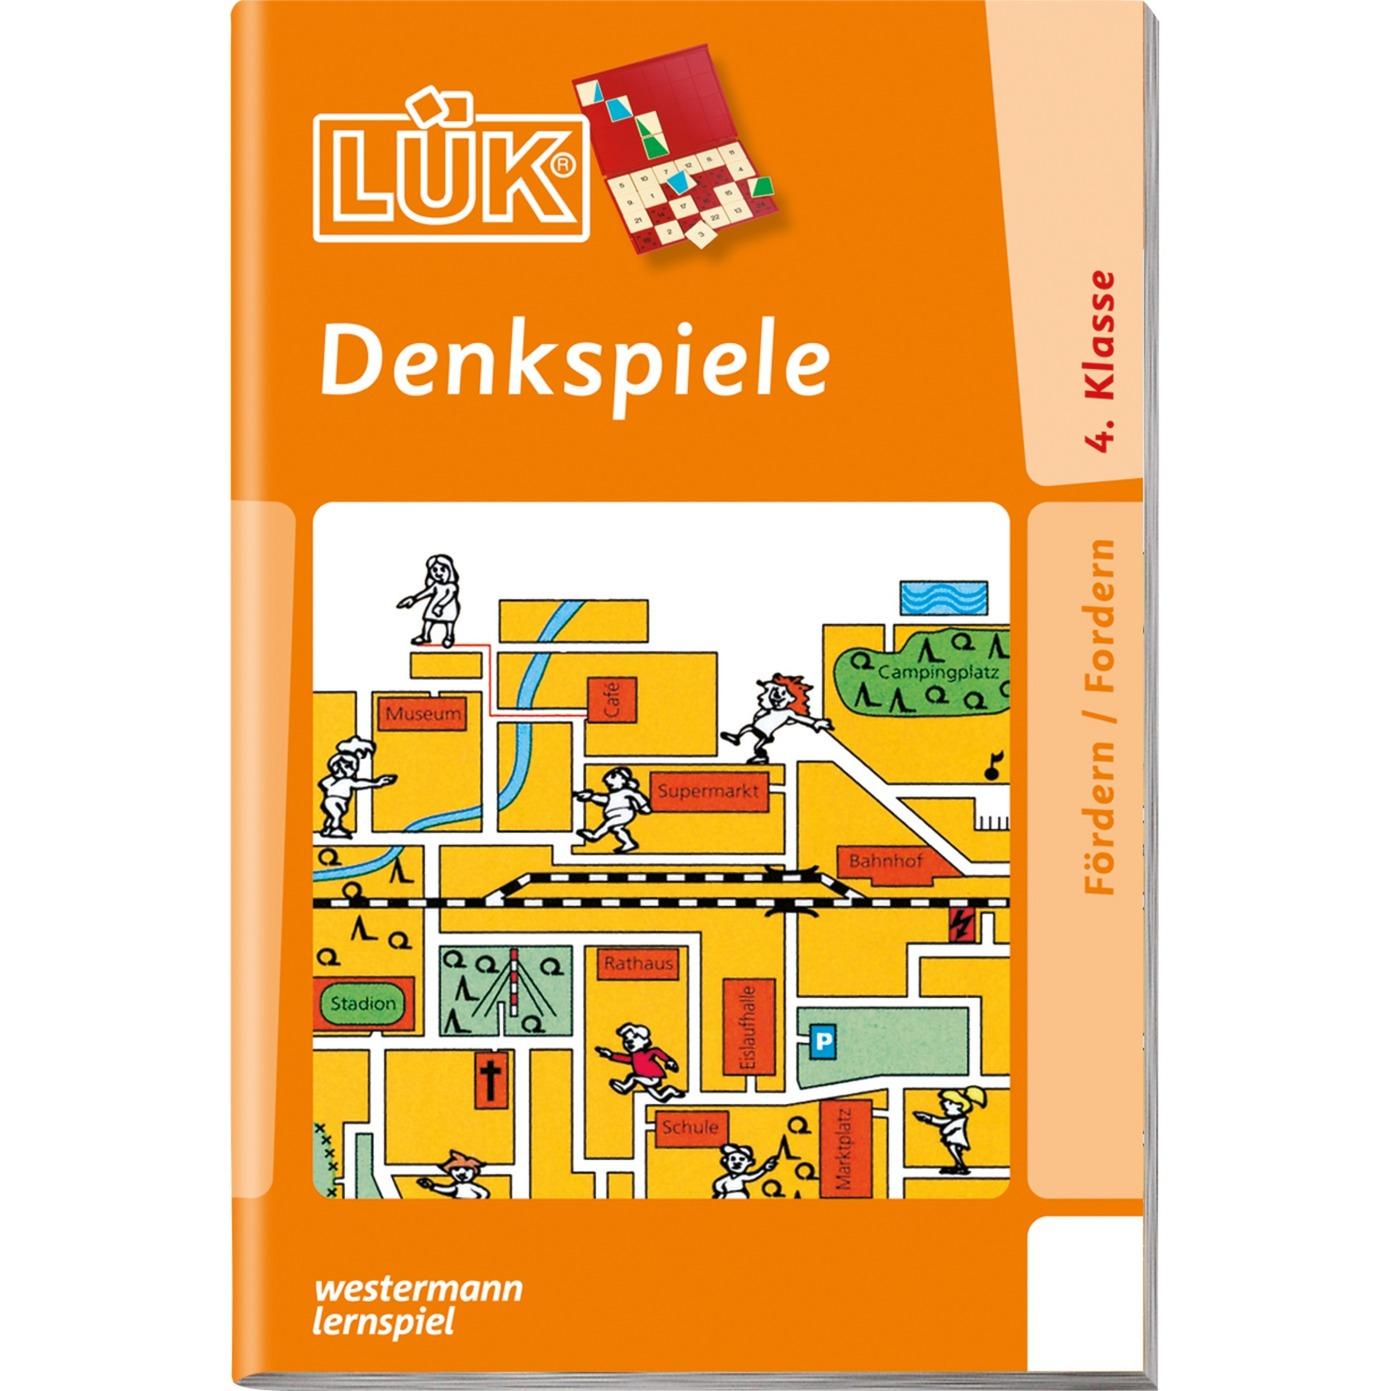 WESTERMANN LÜK-Heft: Denkspiele 2, Lernbuch jetztbilligerkaufen